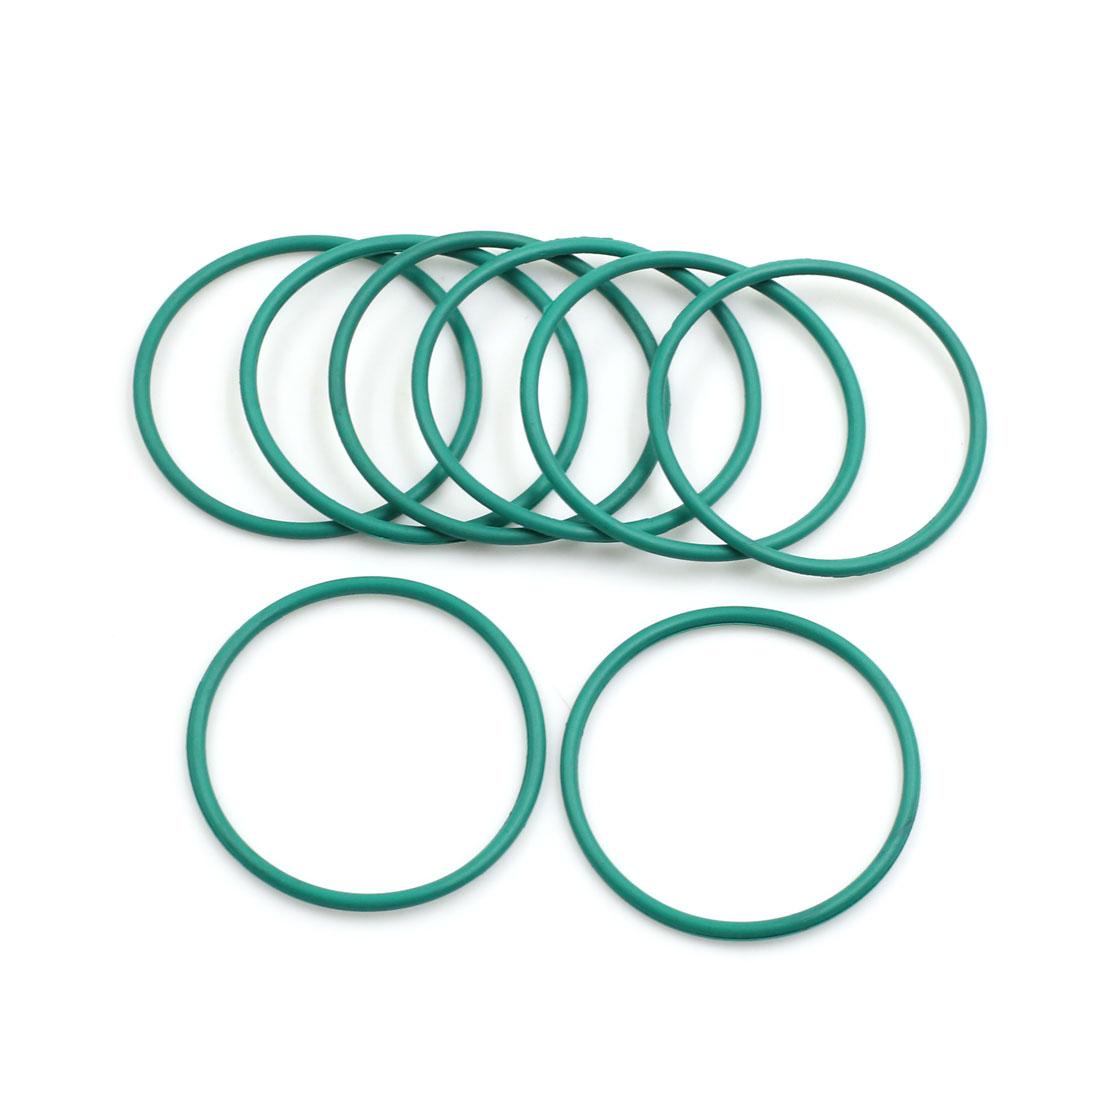 8pcs Green Universal FKM O-Ring Sealing Gasket Washer for Car 40mm x 2mm